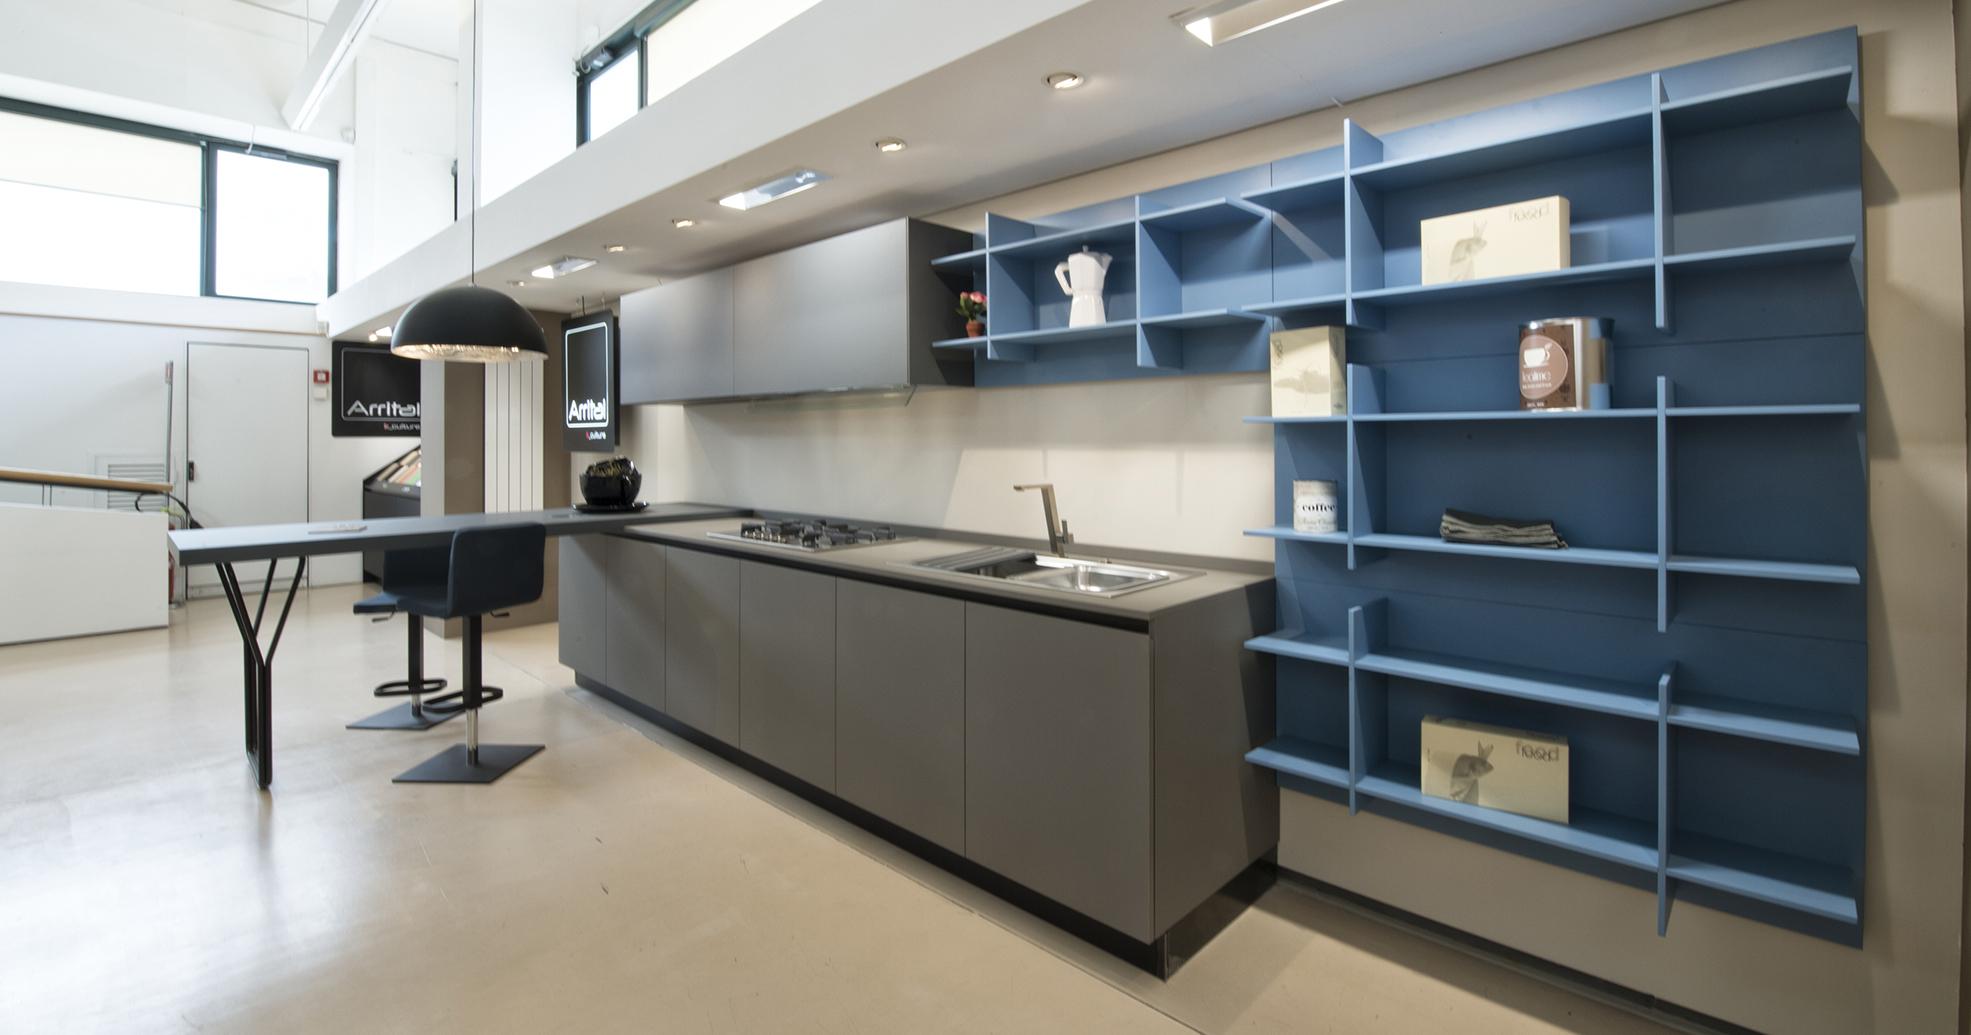 Cucina-Ako6-Arrital-Kitchen-Saldi-arredamento-Addessi-Design